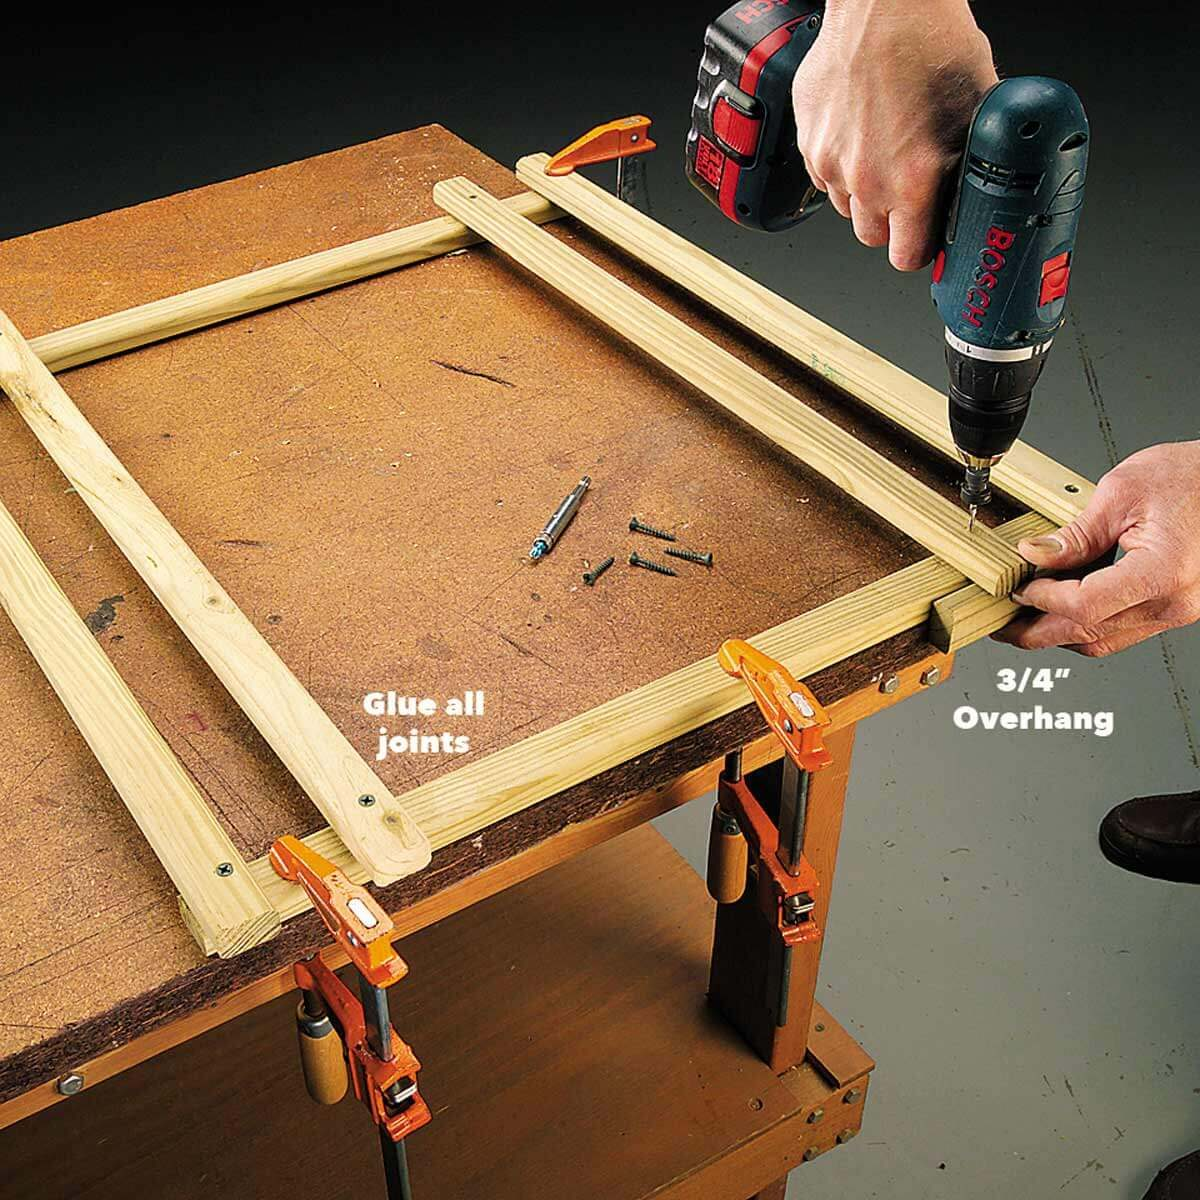 assemble boot scraper